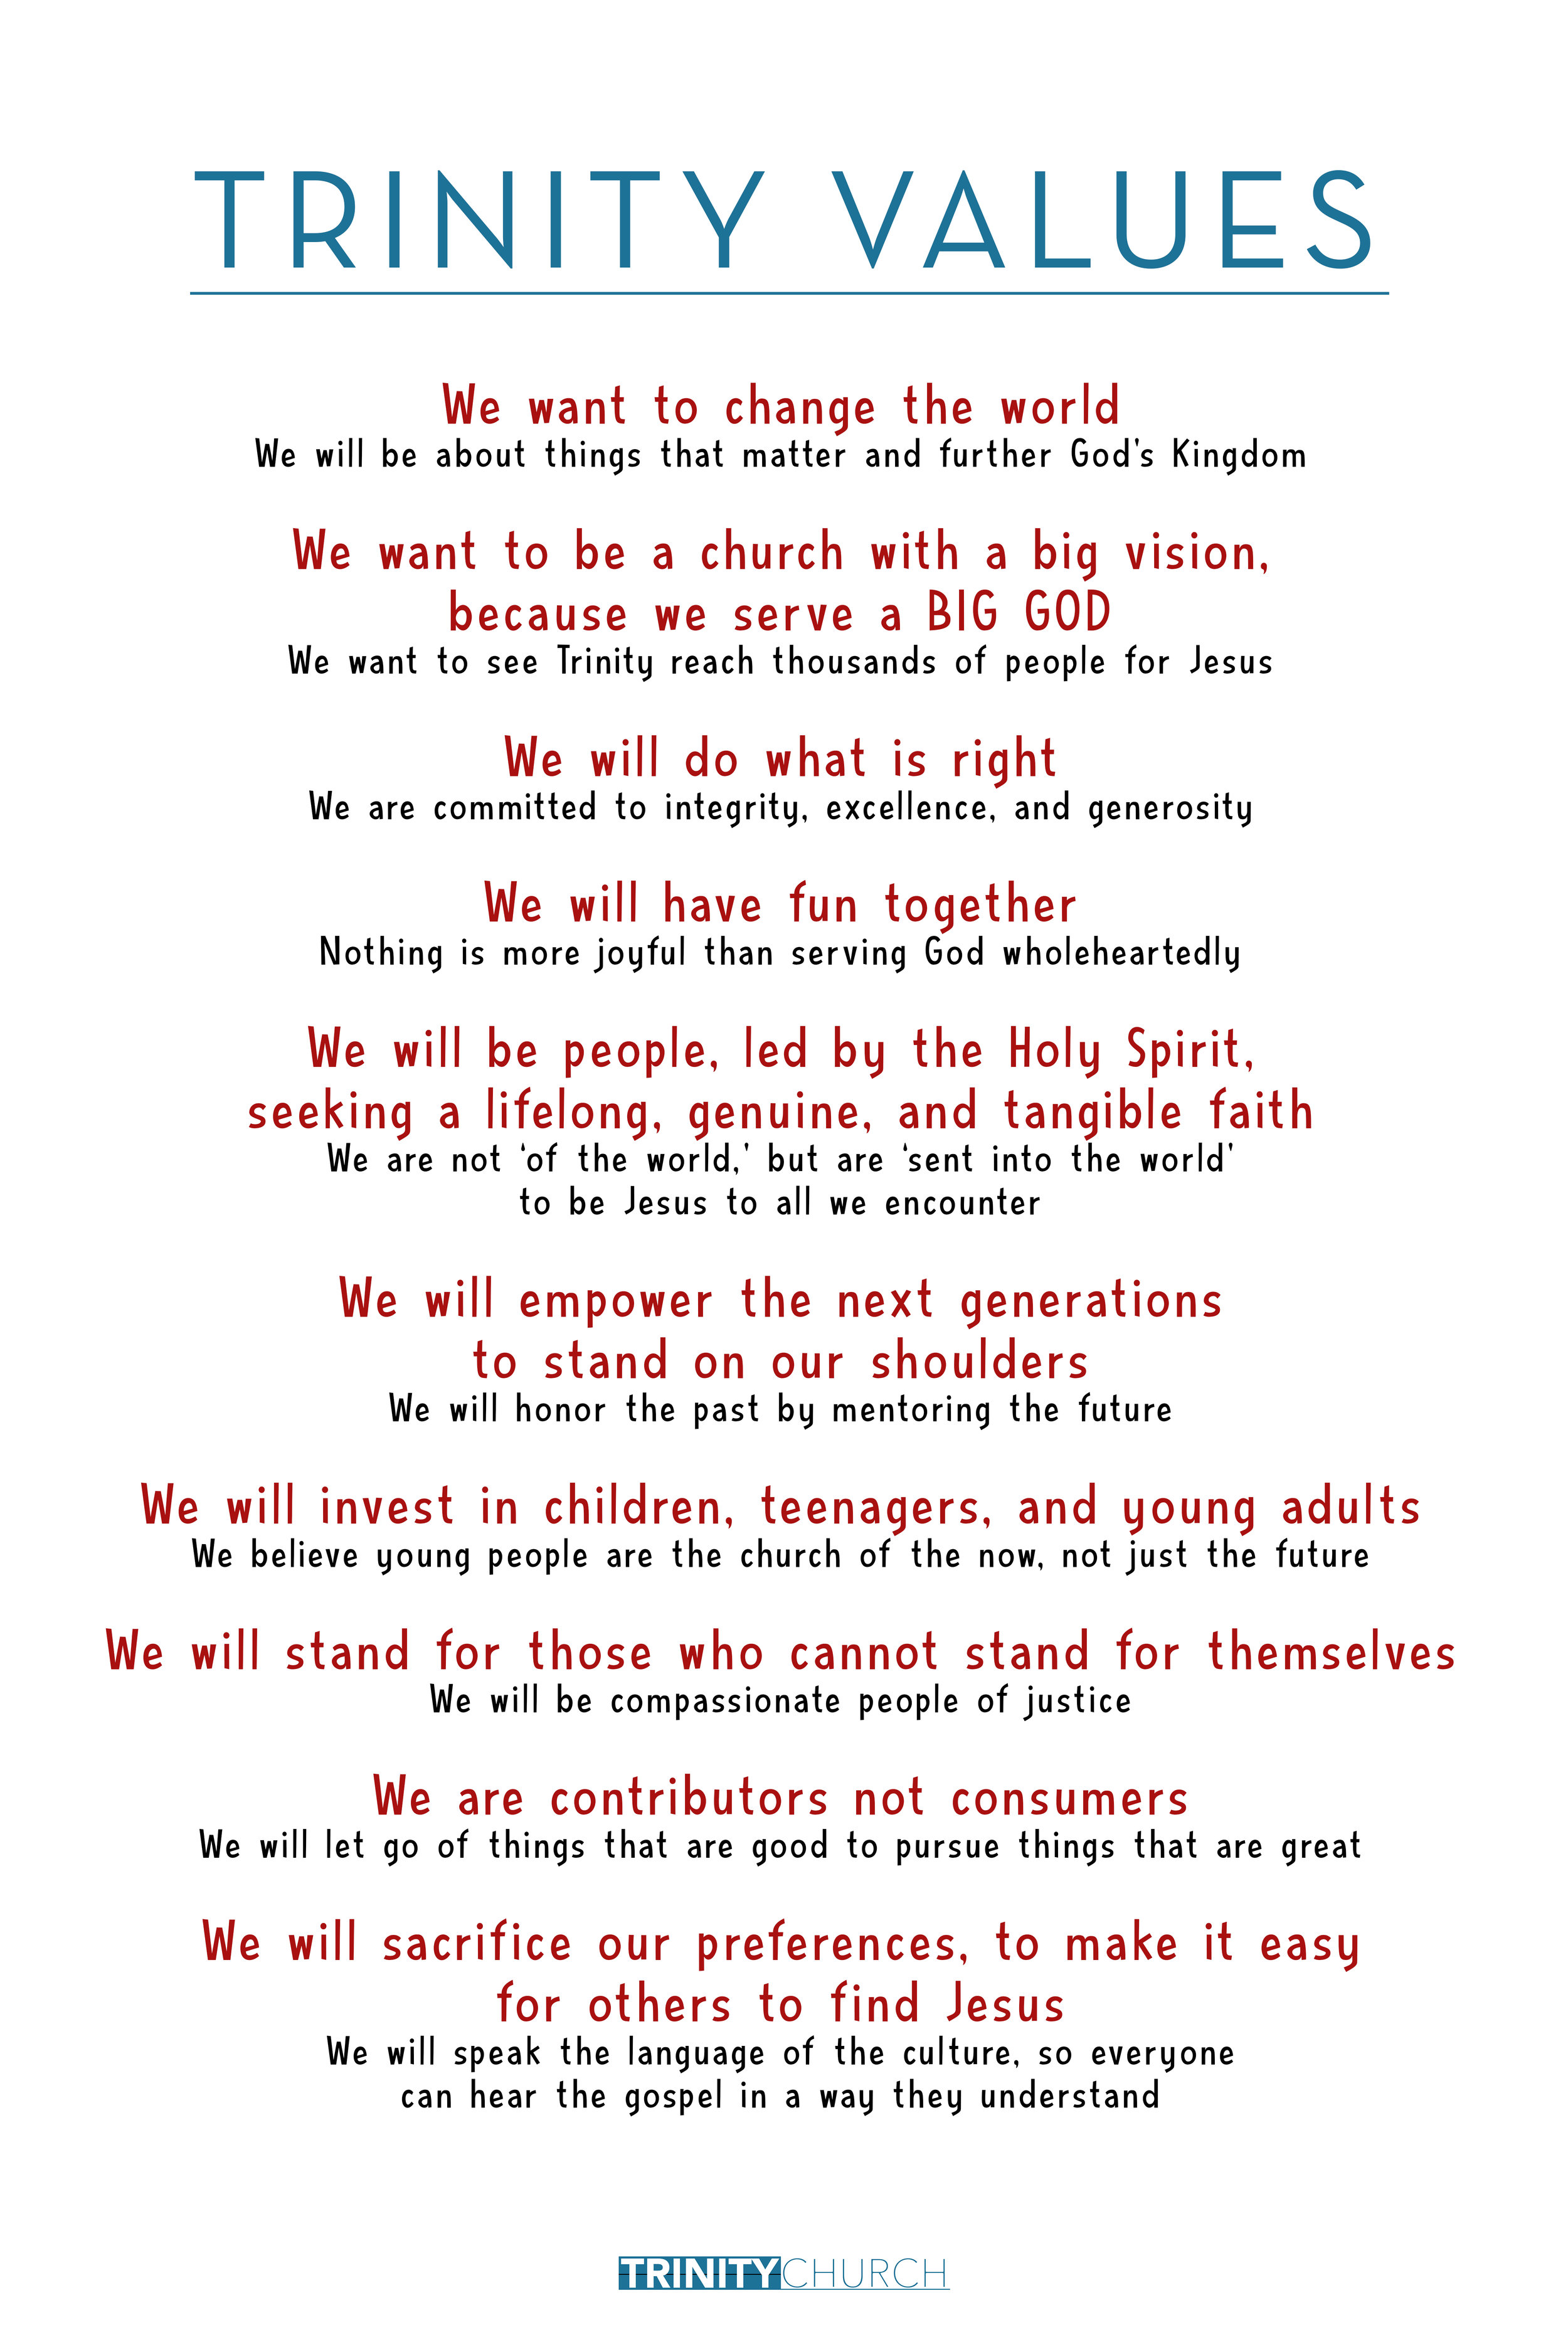 Values Poster 8.18.18.jpg